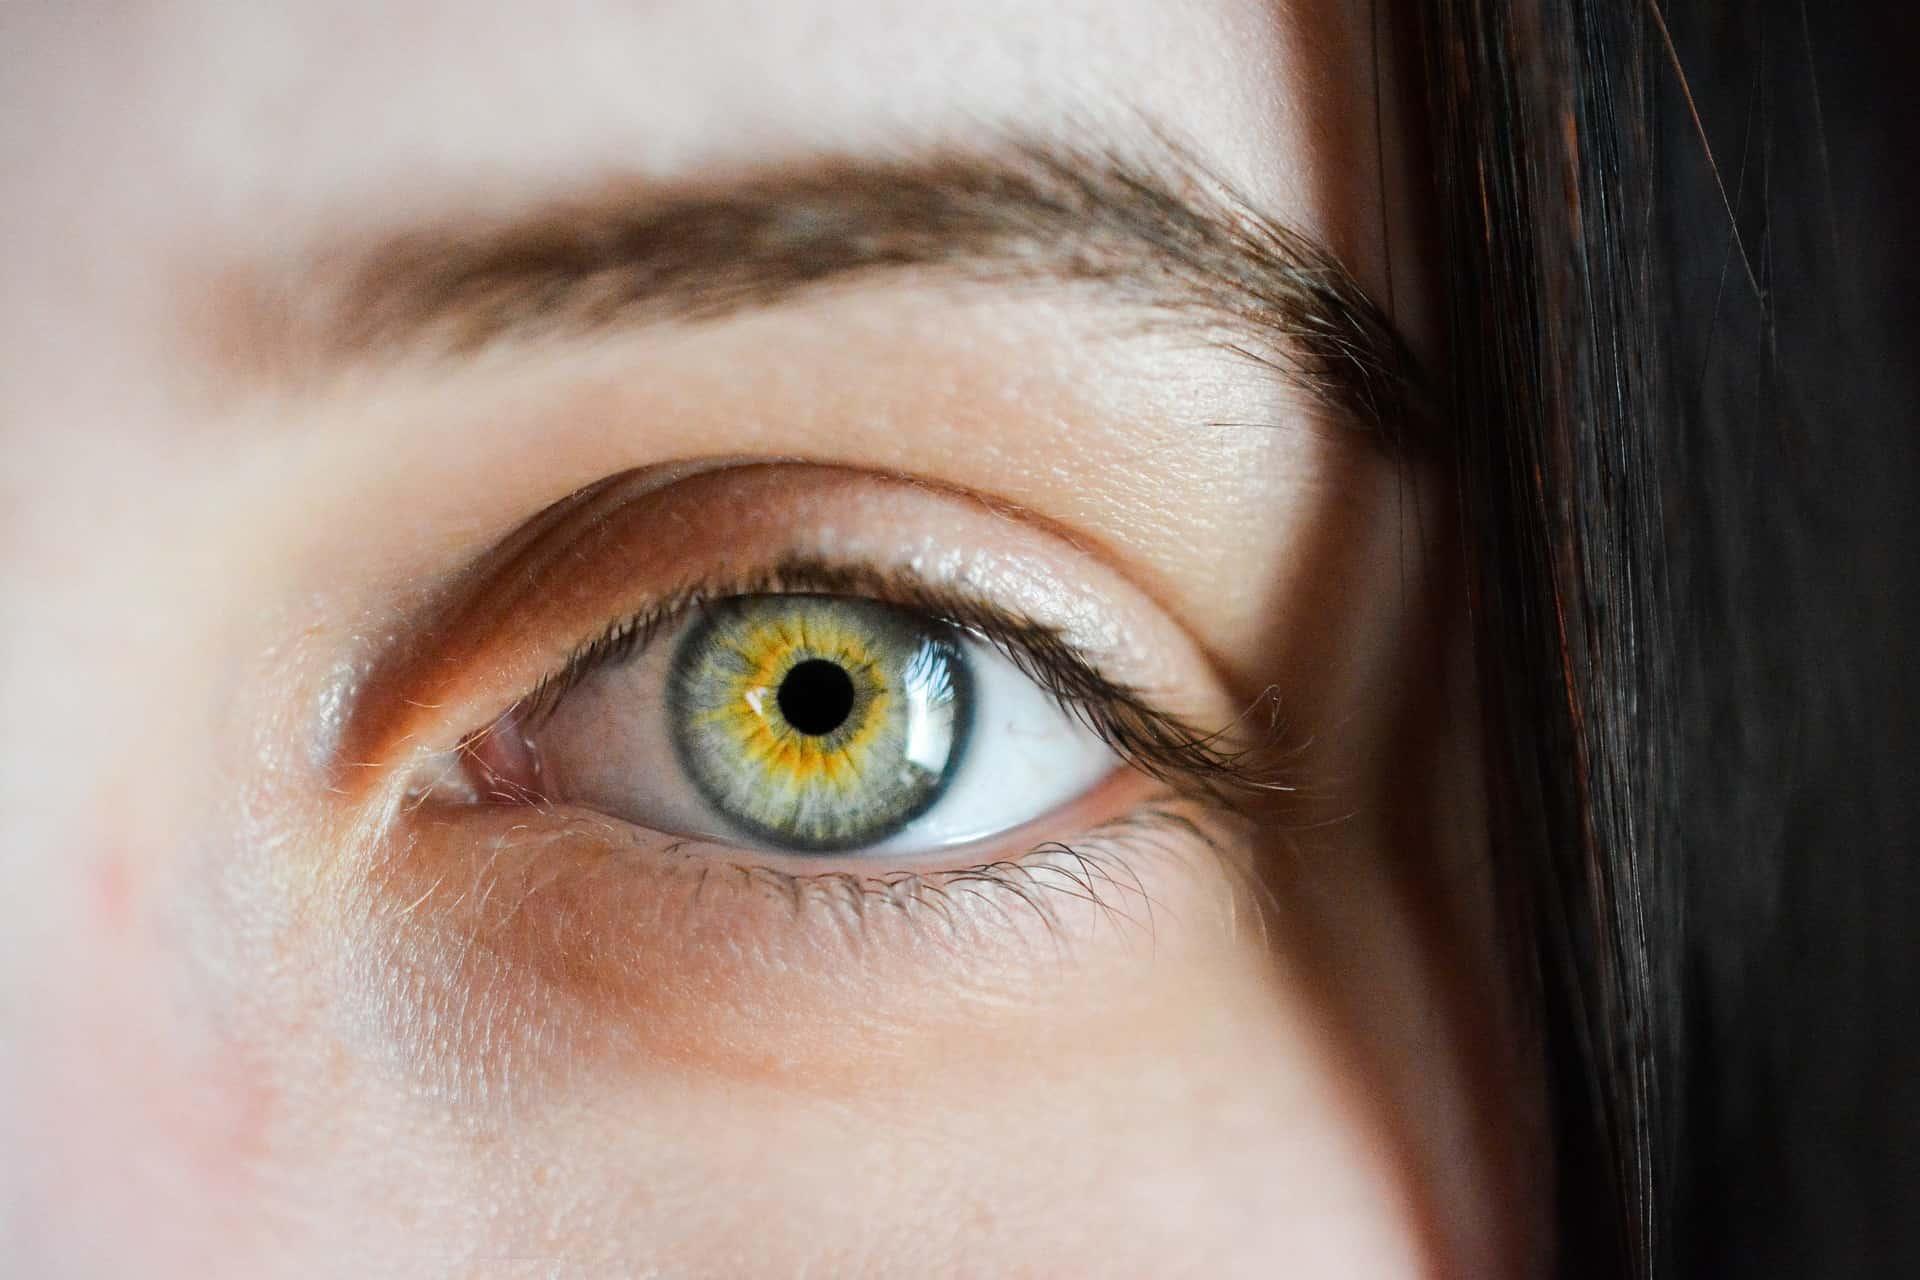 https://pixabay.com/en/eye-iris-algae-macro-blur-natural-2340806/